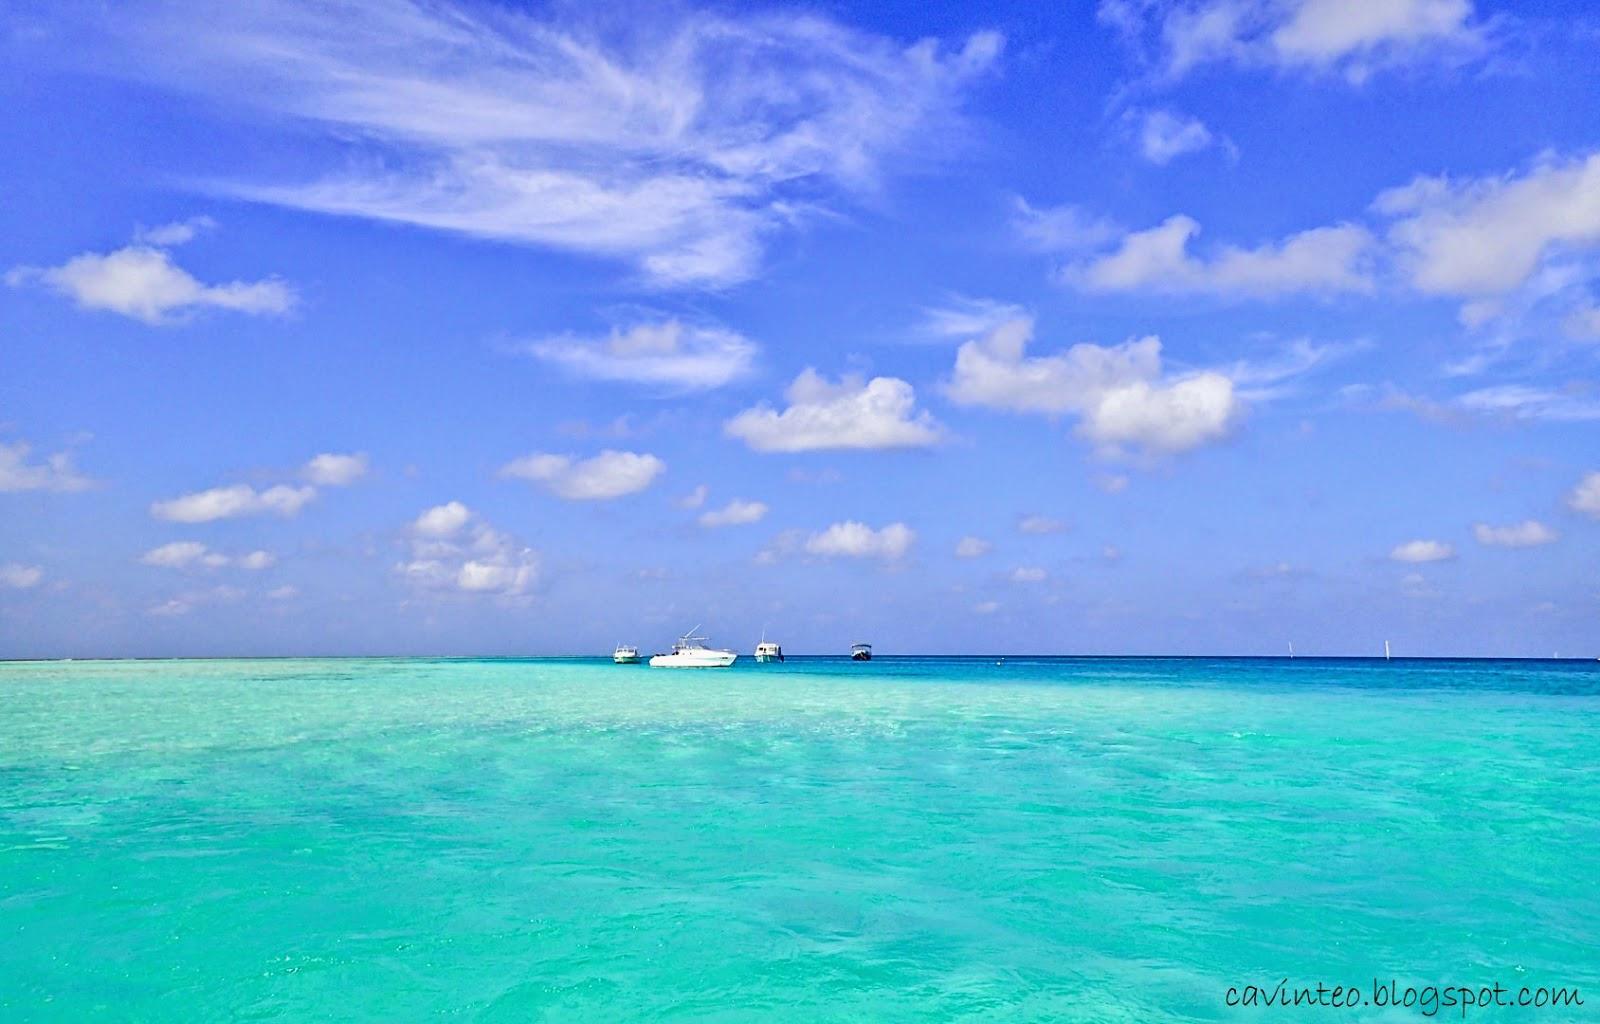 rihiveli beach maldives wallpapers - Rihiveli Beach Maldives Wallpapers HD Wallpapers